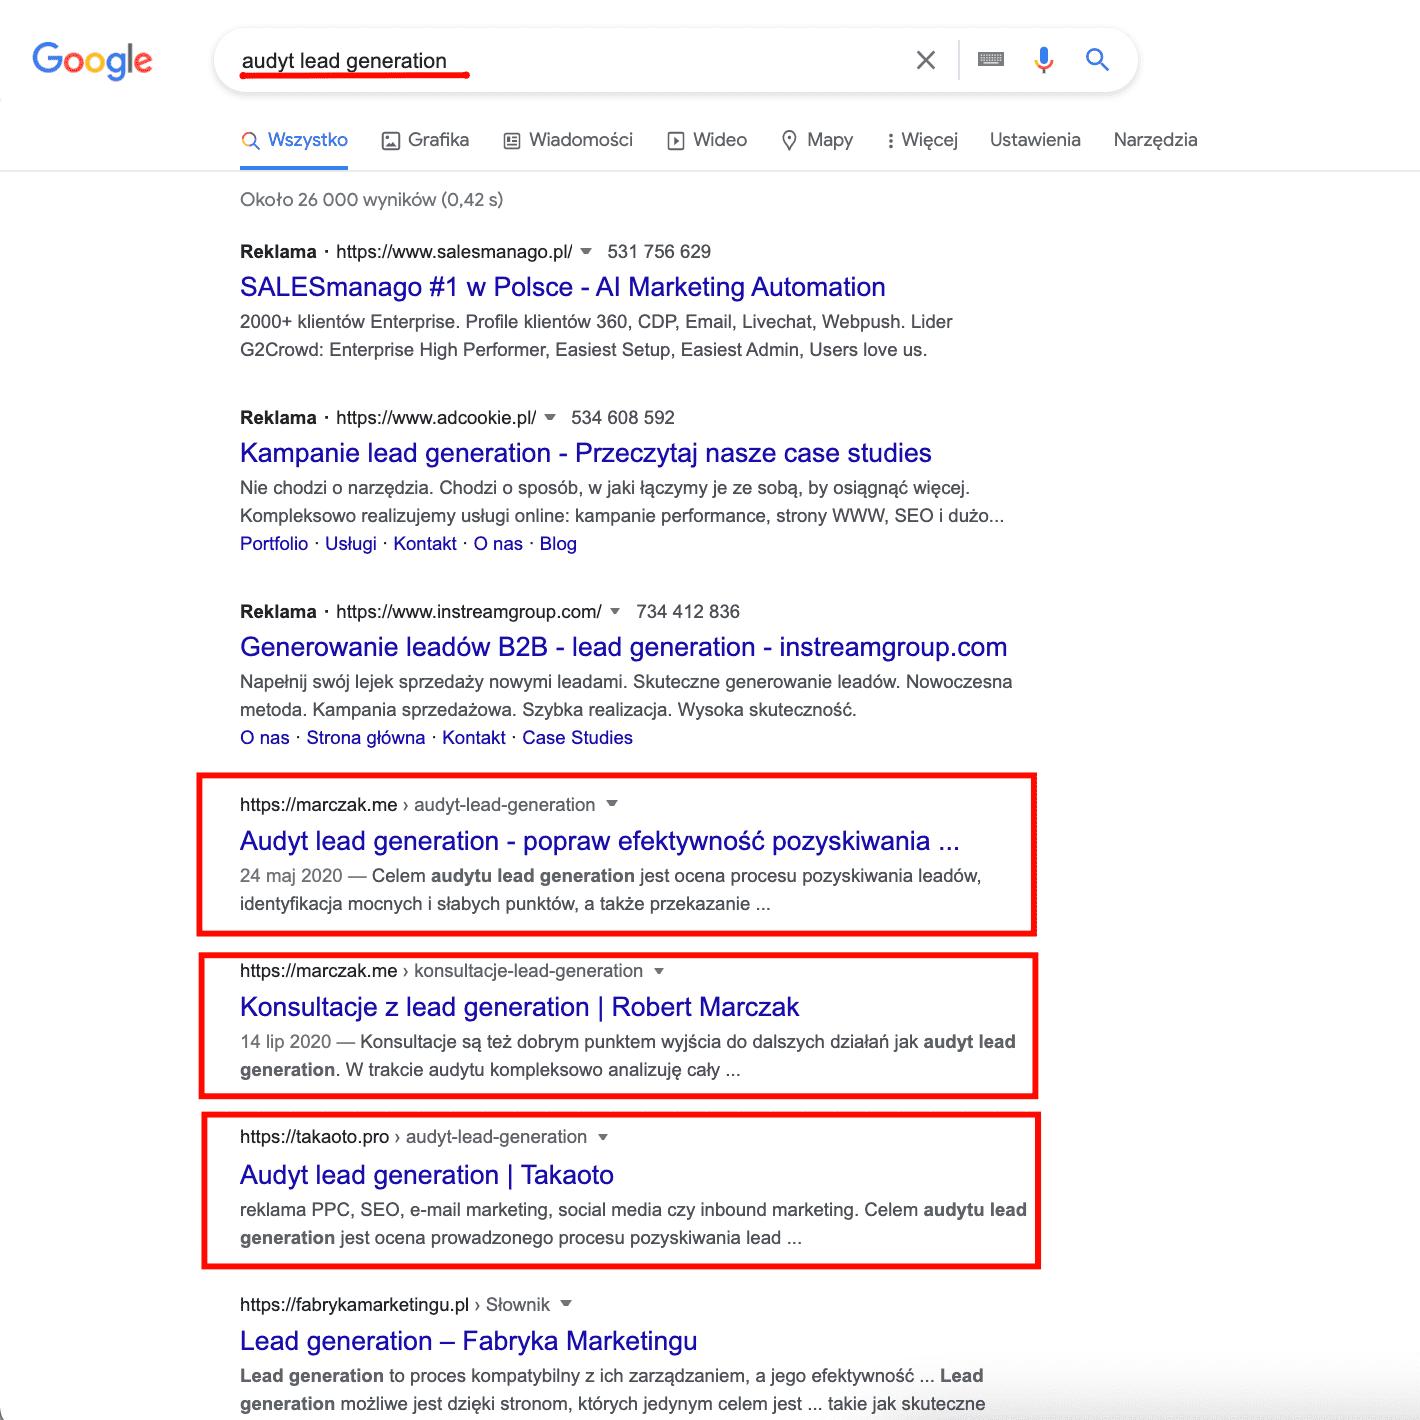 audyt lead generation screen google